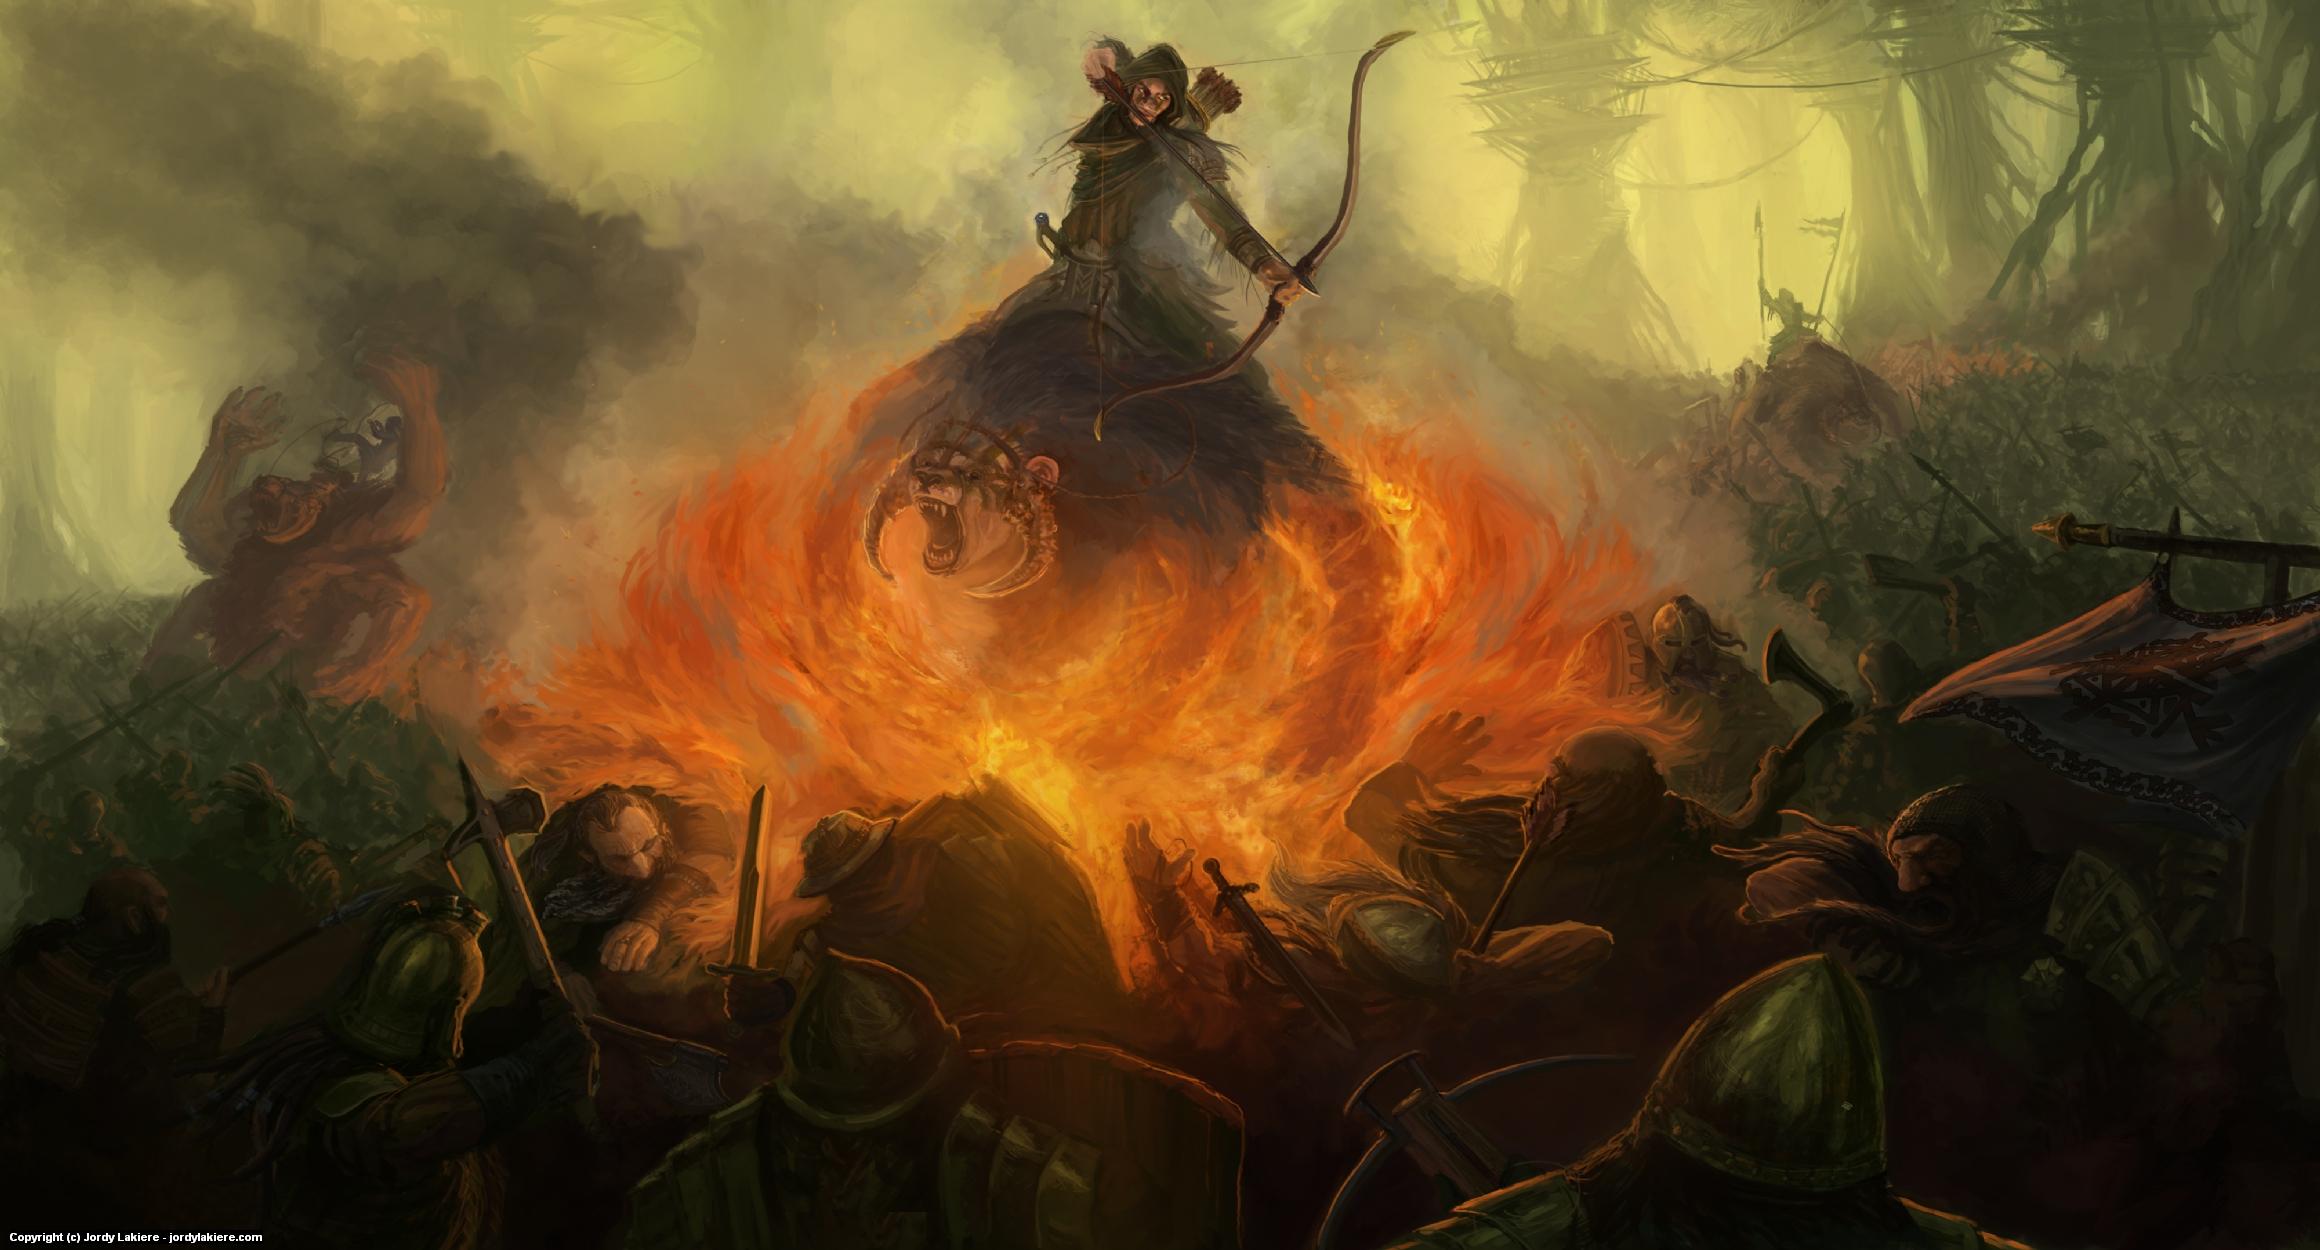 Battle at Monghadi Artwork by Jordy Lakiere